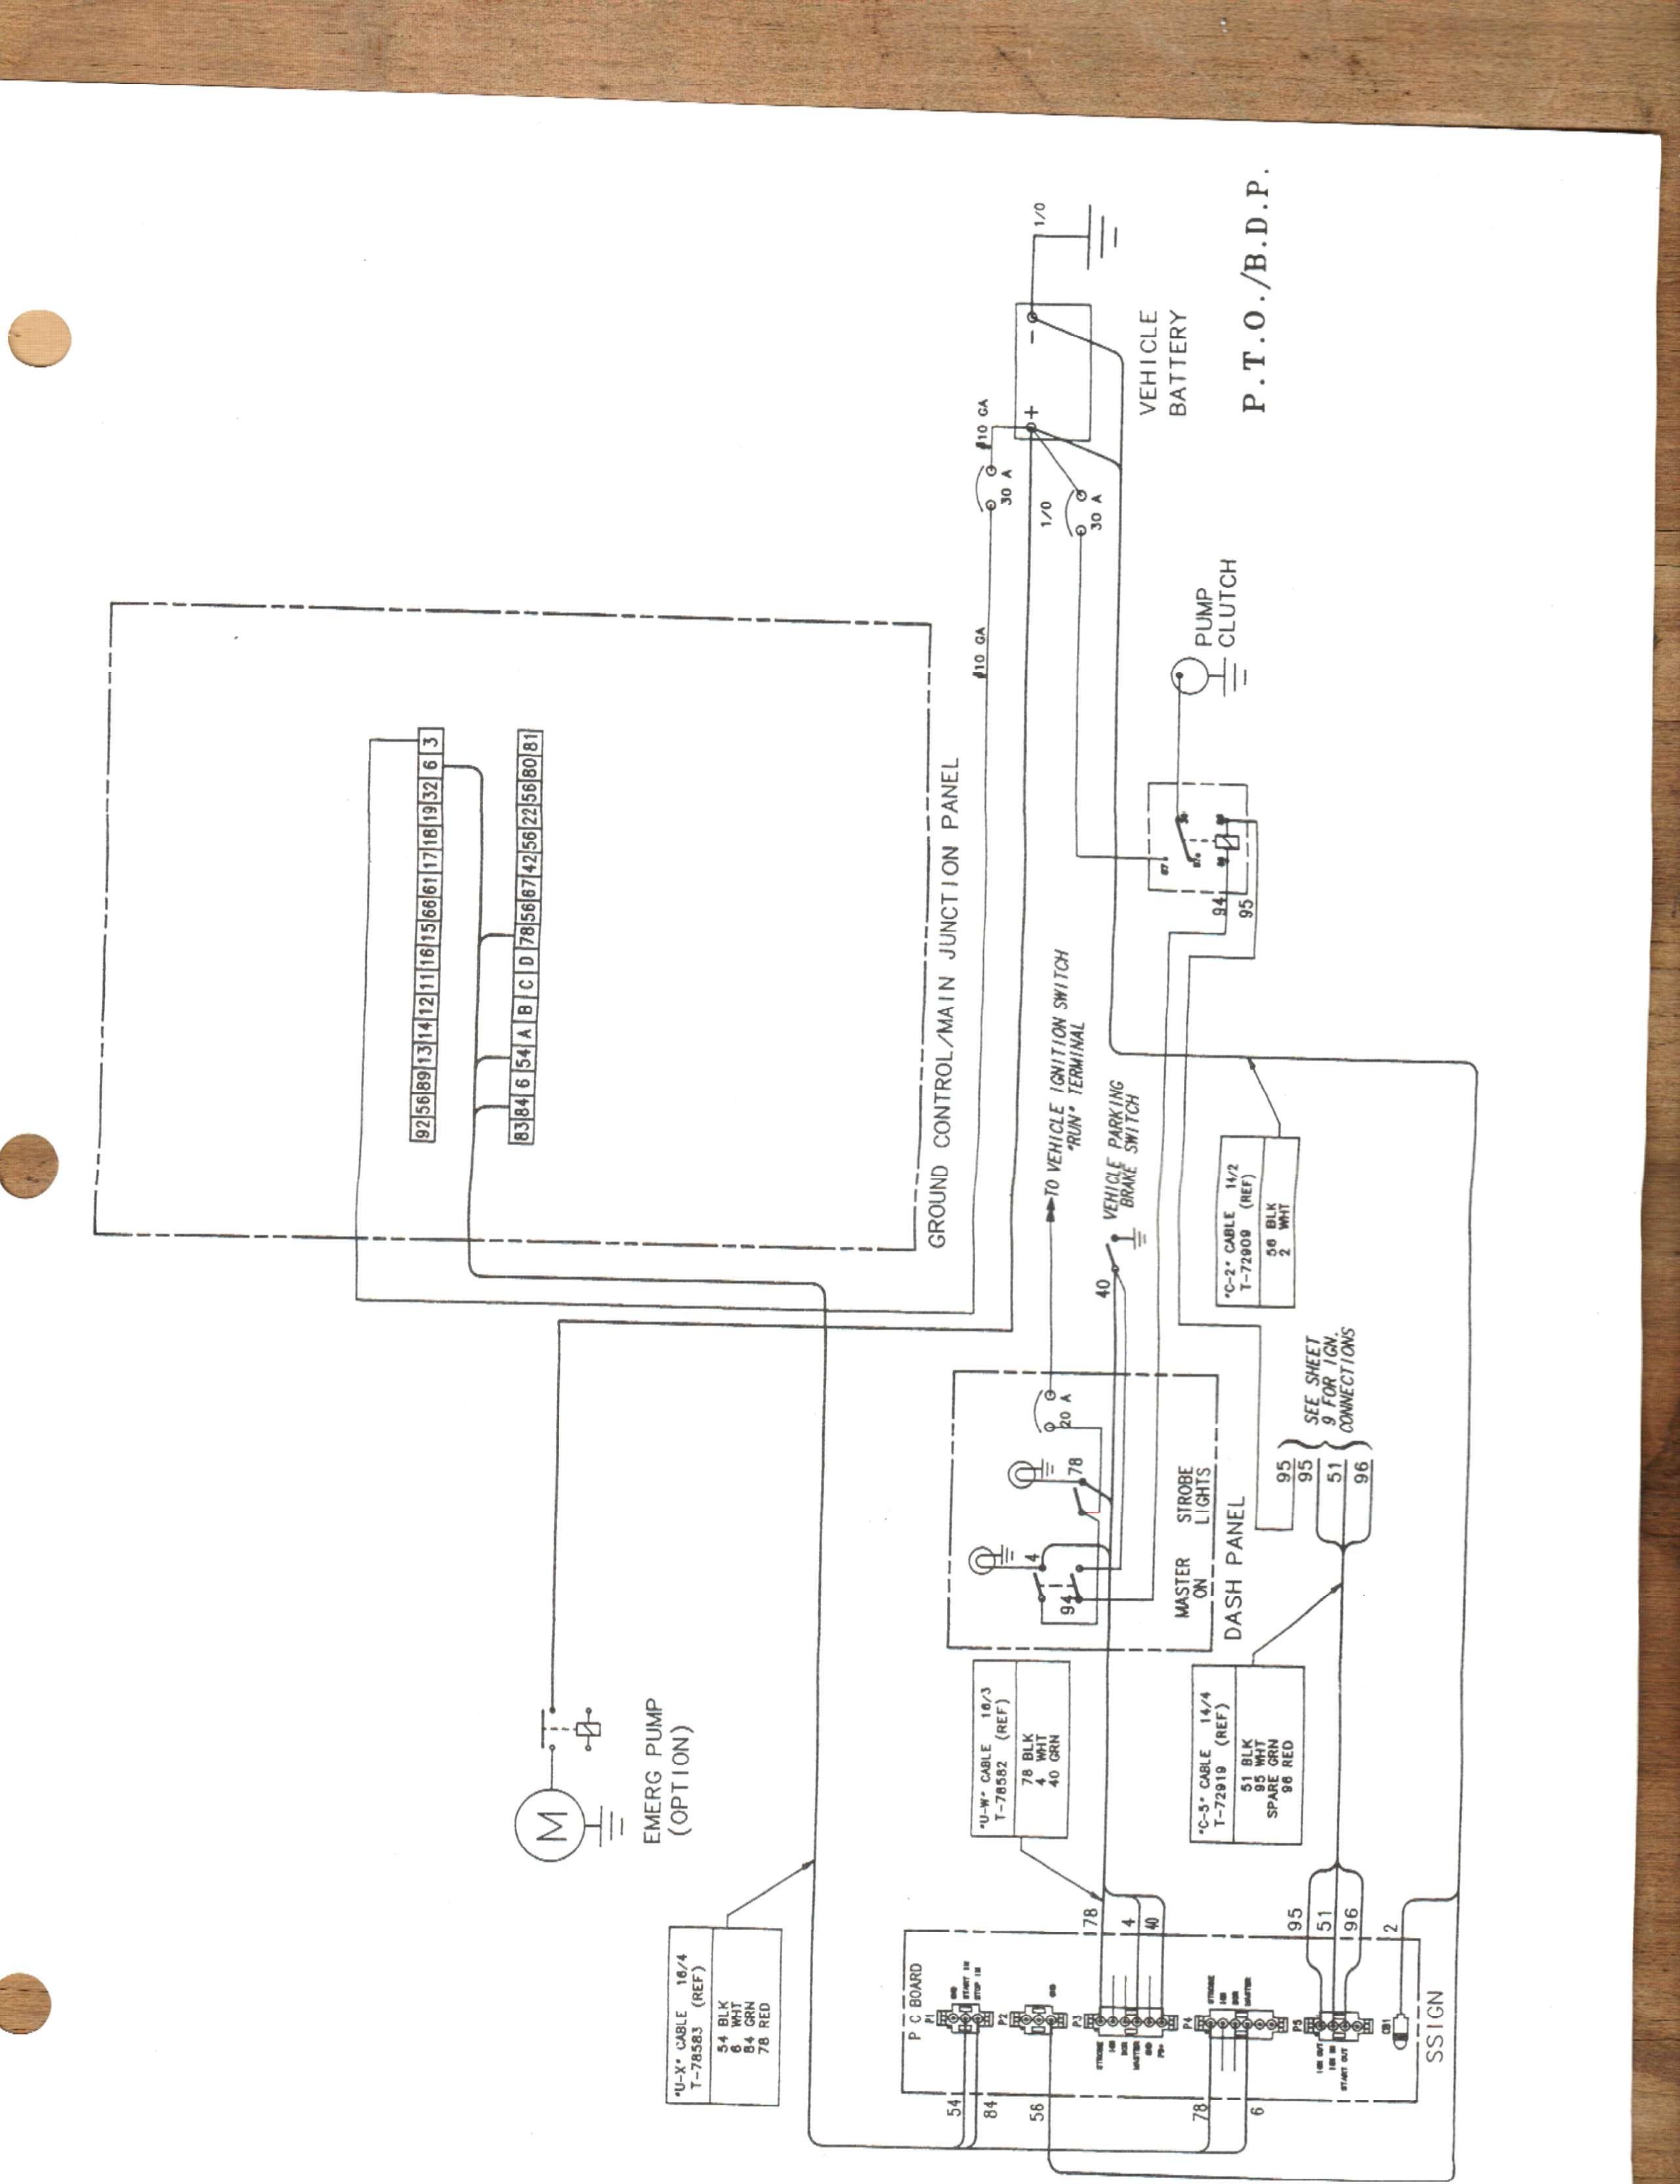 Telsta Wiring Diagram Free For You Onan Generator Bucket Truck Engine Telstra Lift Diagrams T40c